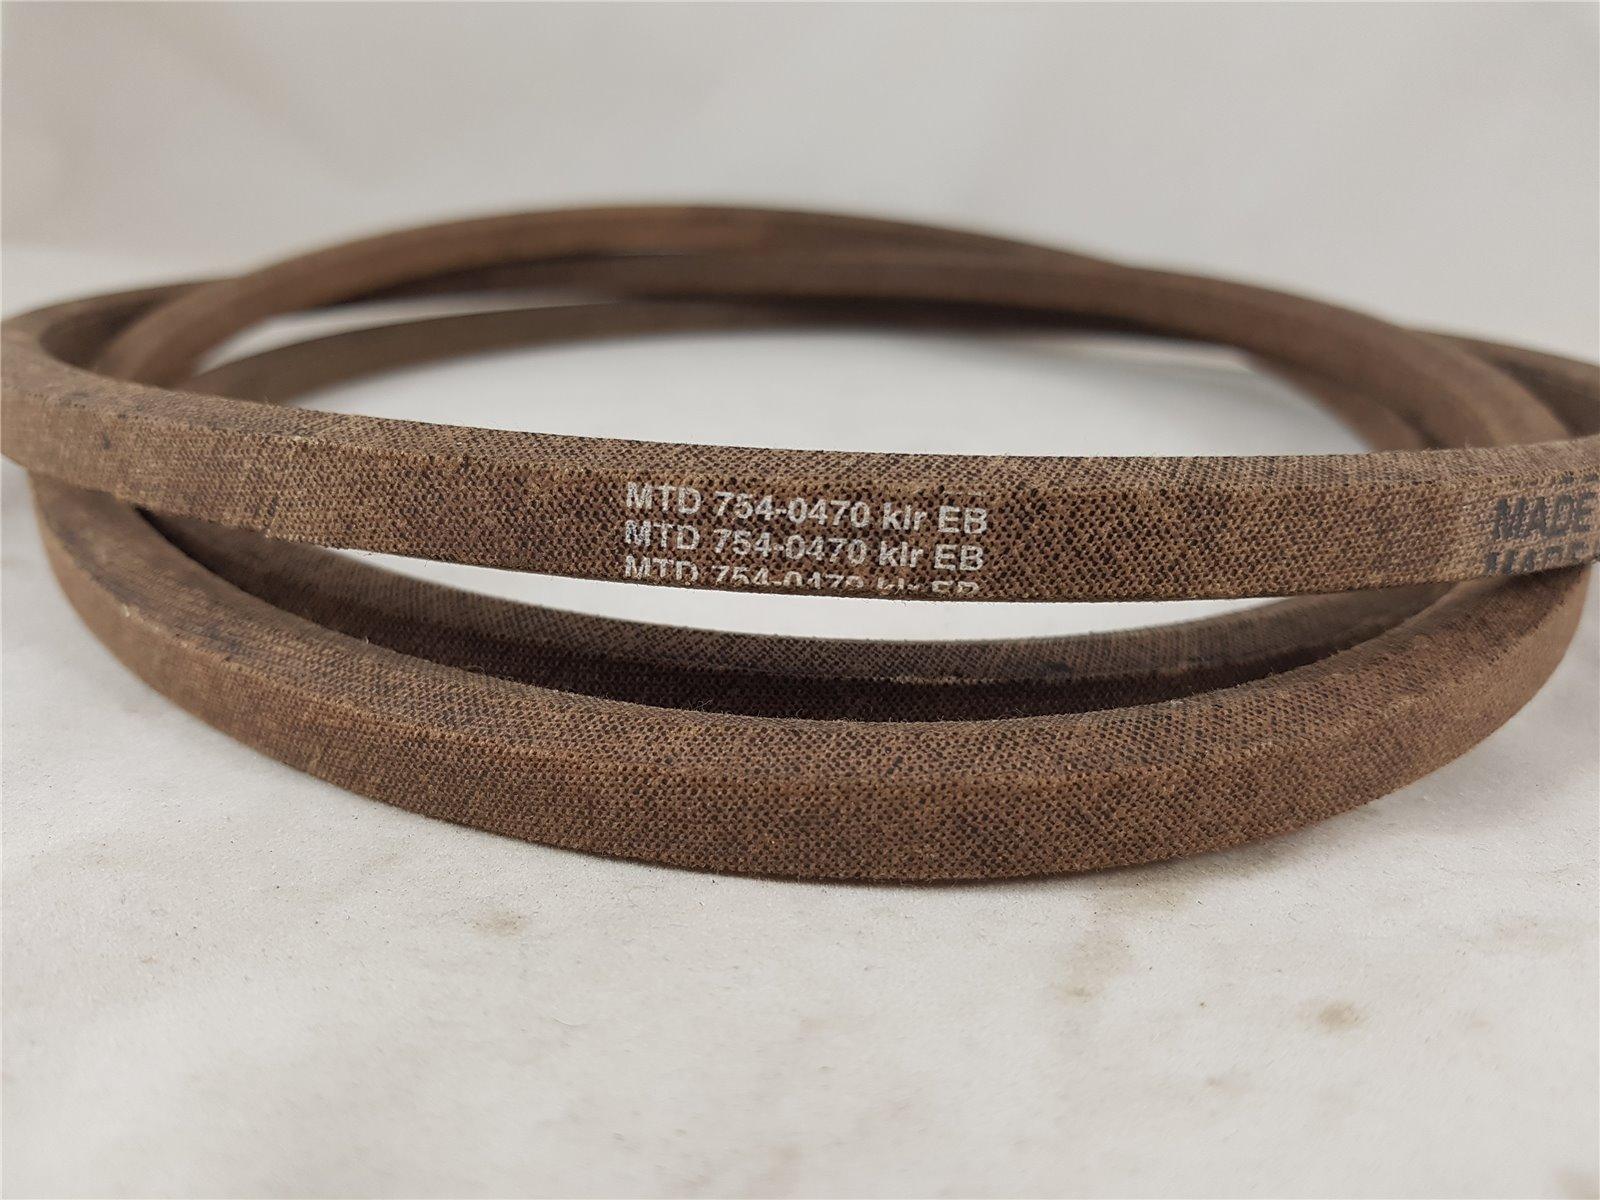 Messernabe passend MTD RH 180 13D7765N600 Rasentraktor